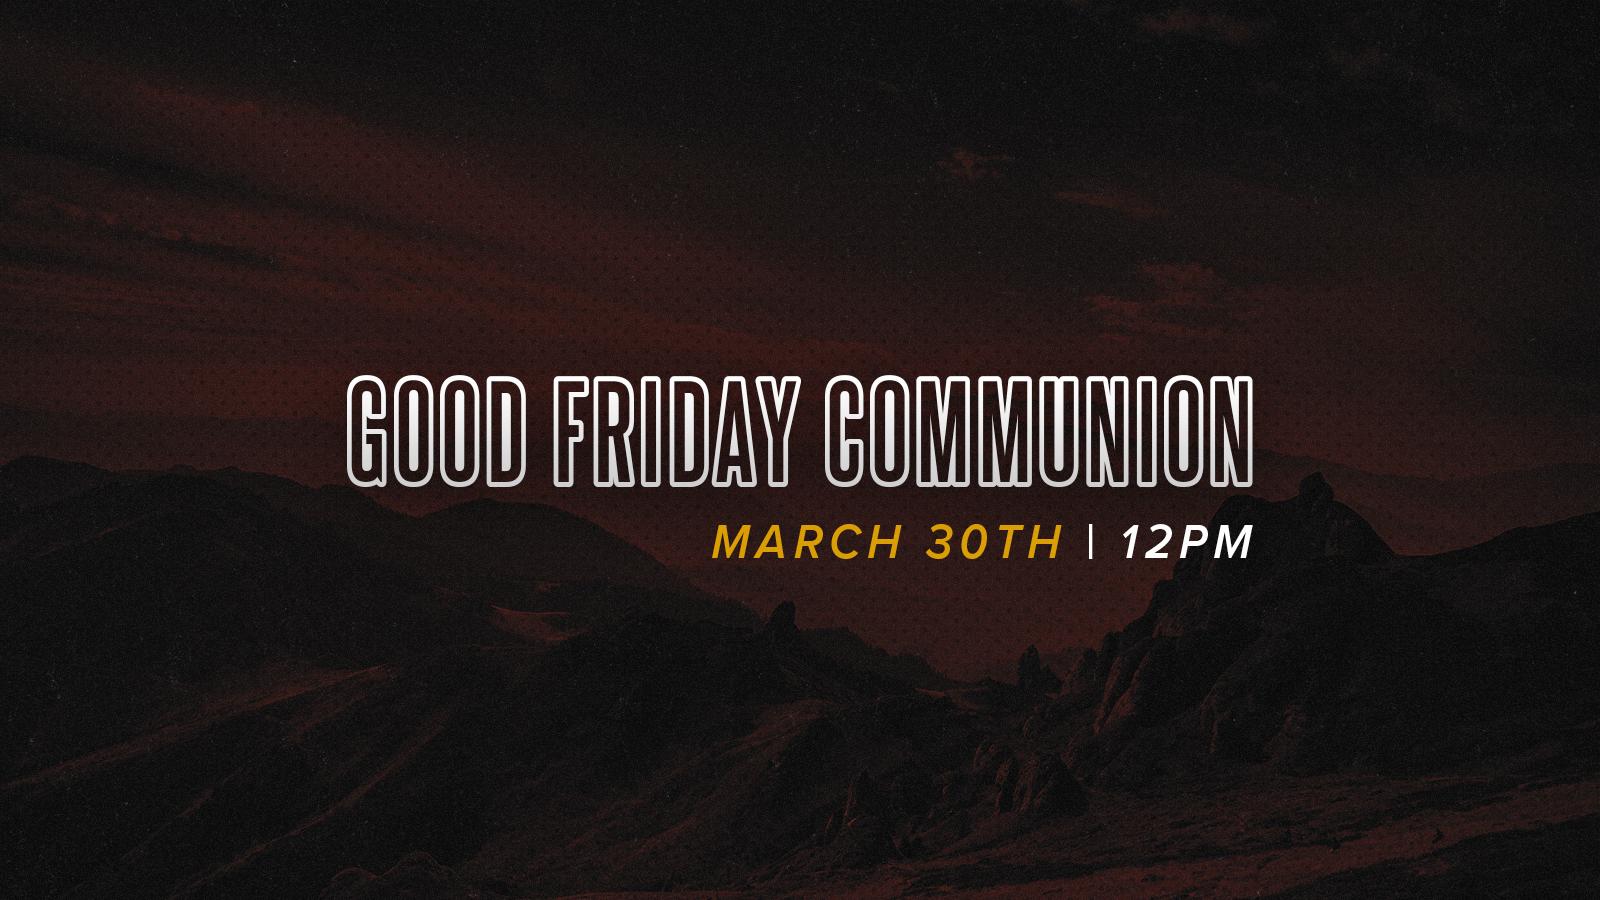 Good-Friday-Communion.jpg